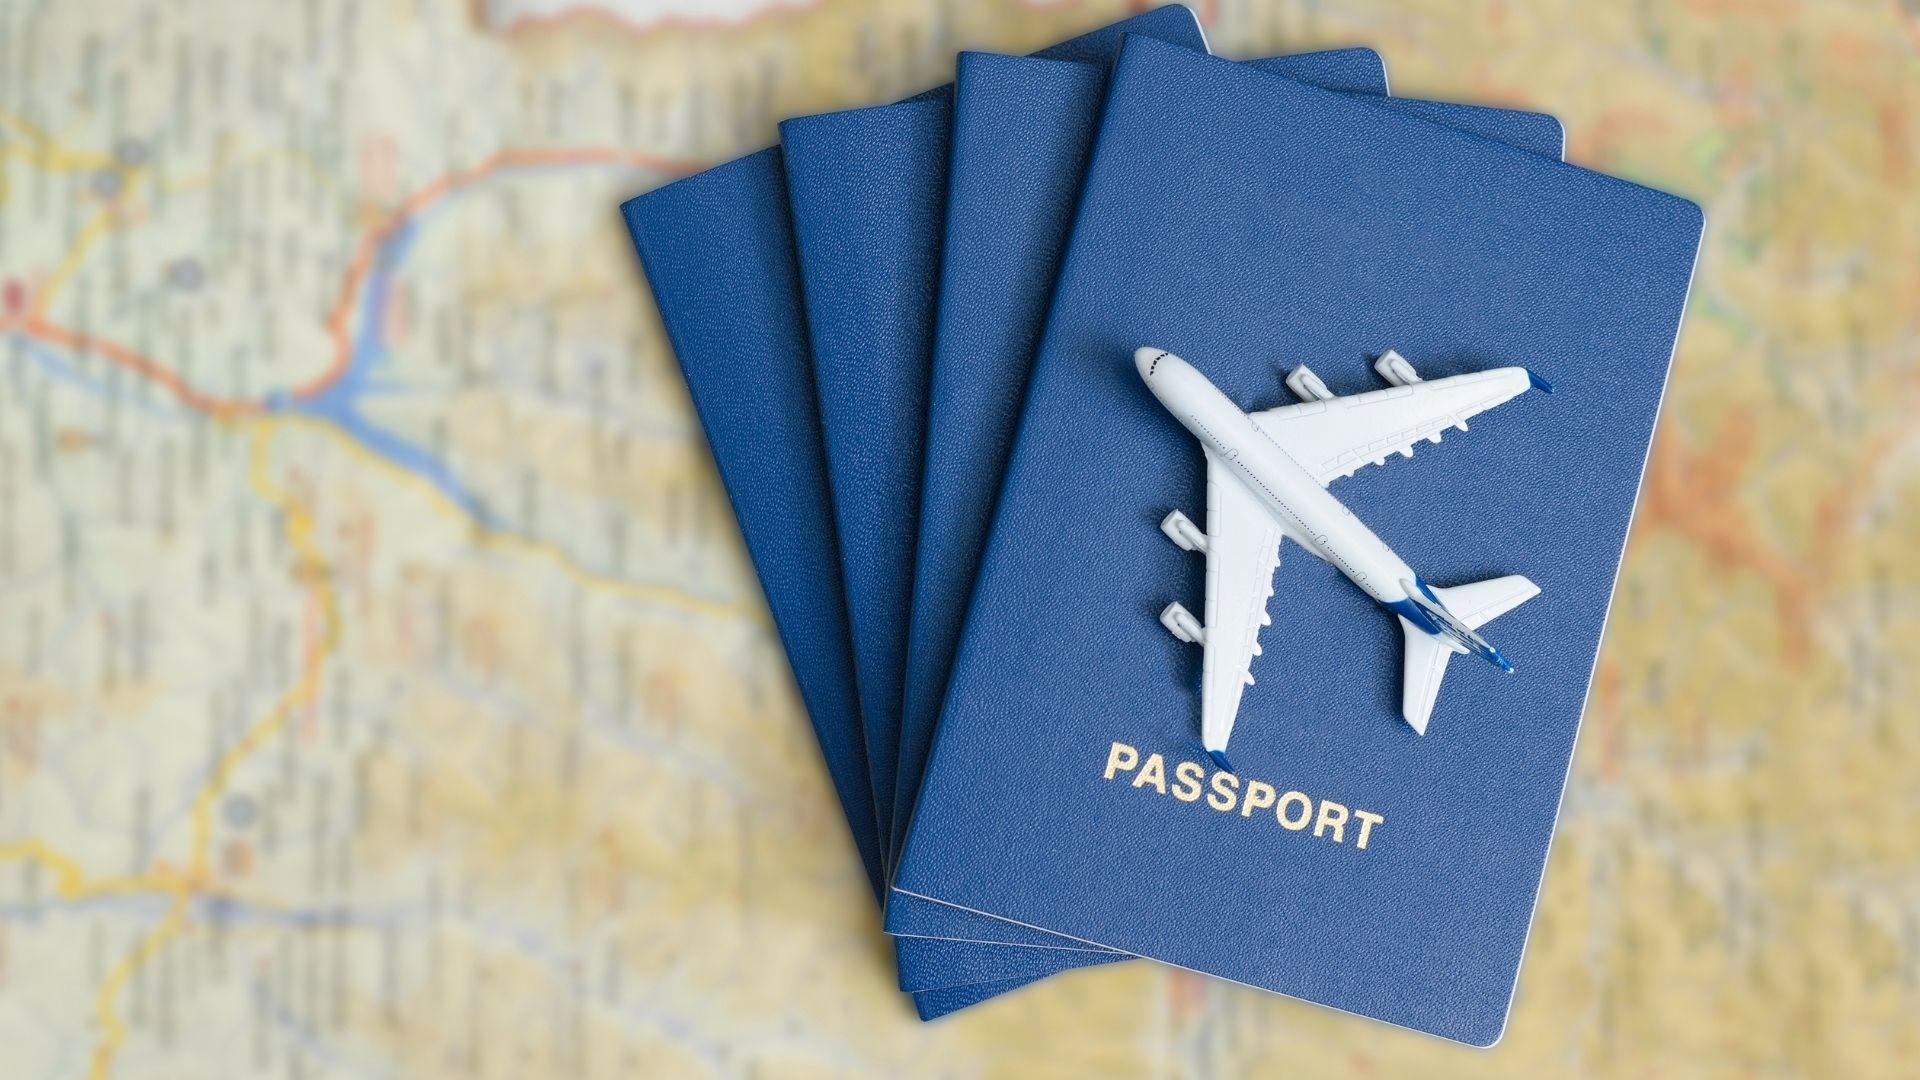 Avrupa Seyahati Schengen İle Mümkün!